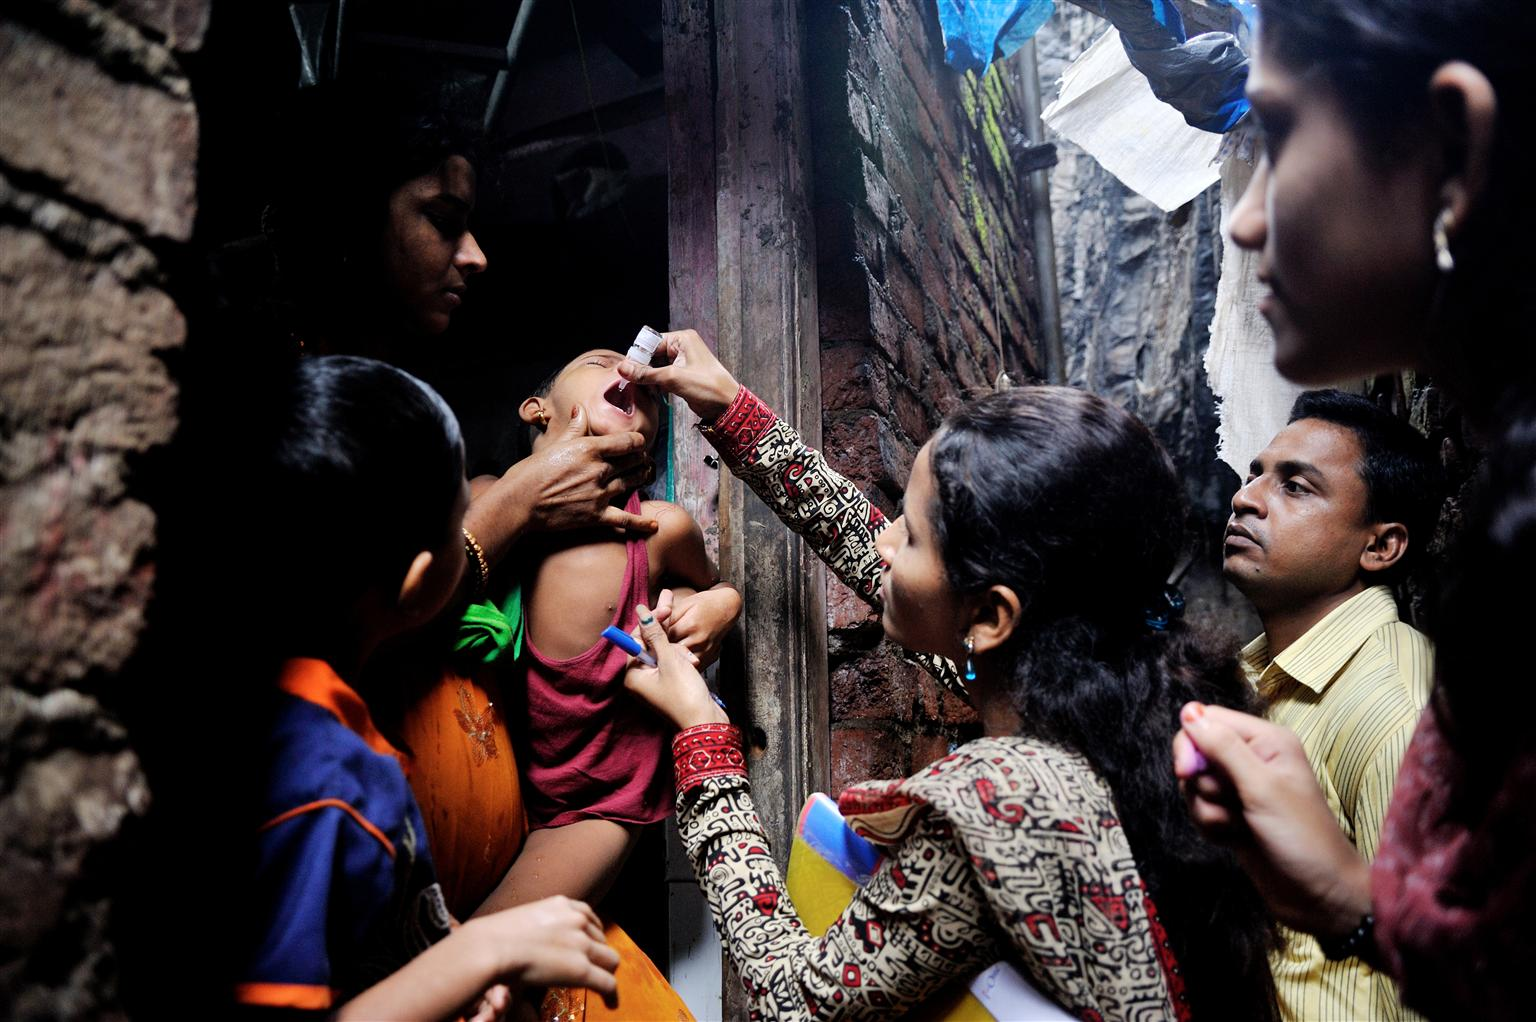 UNICEF/INDA2012-00433/Sandeep Biswas